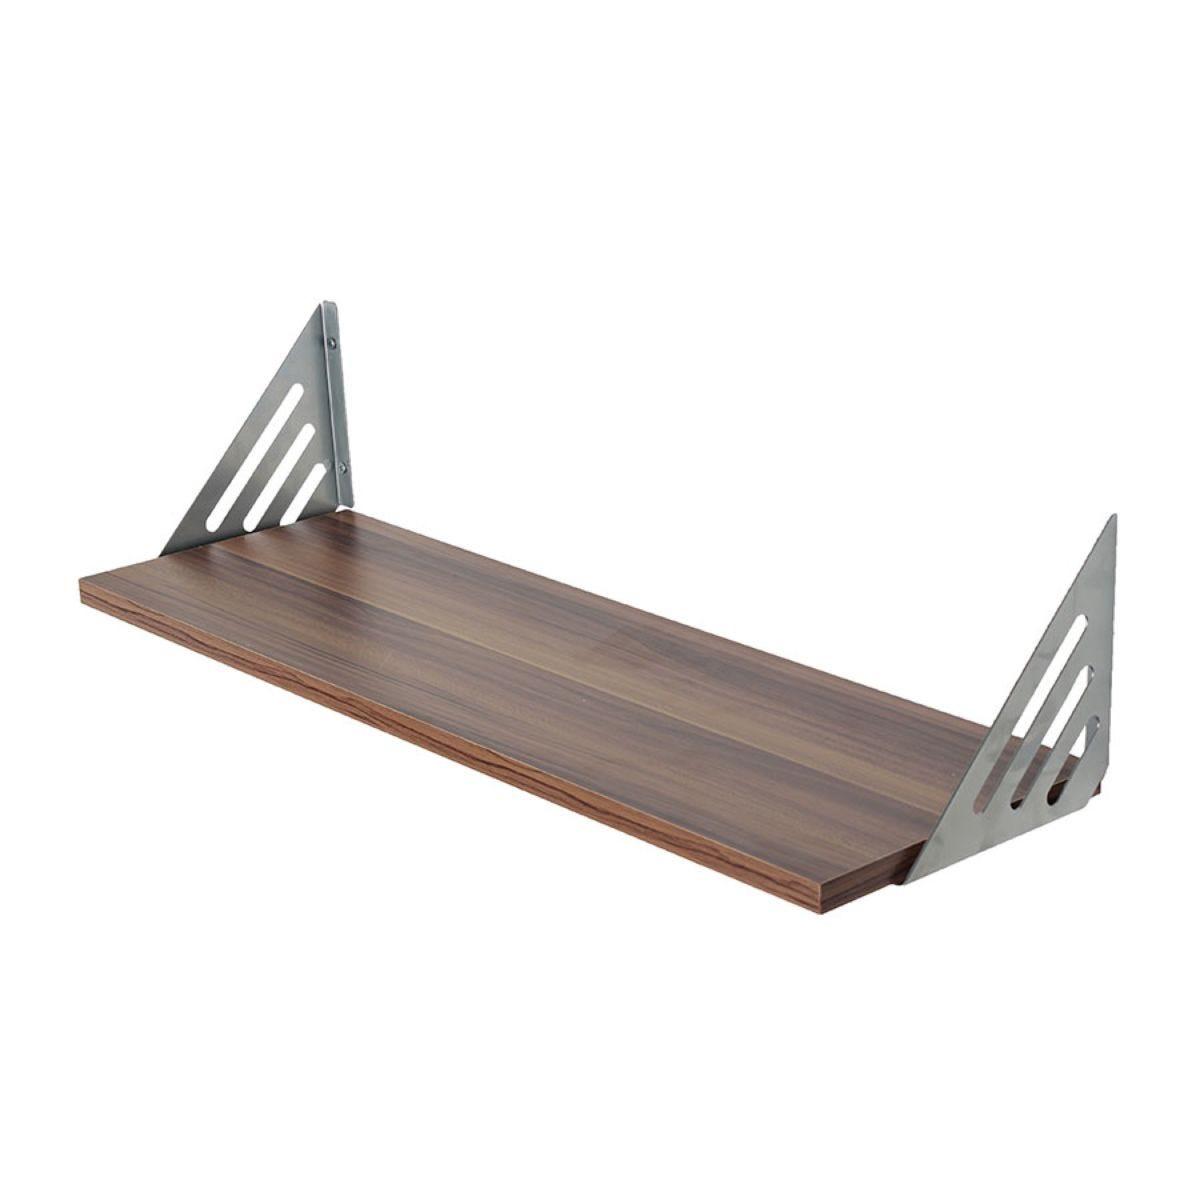 Core Products 60cm Floating Shelf Kit with Bracket - Walnut